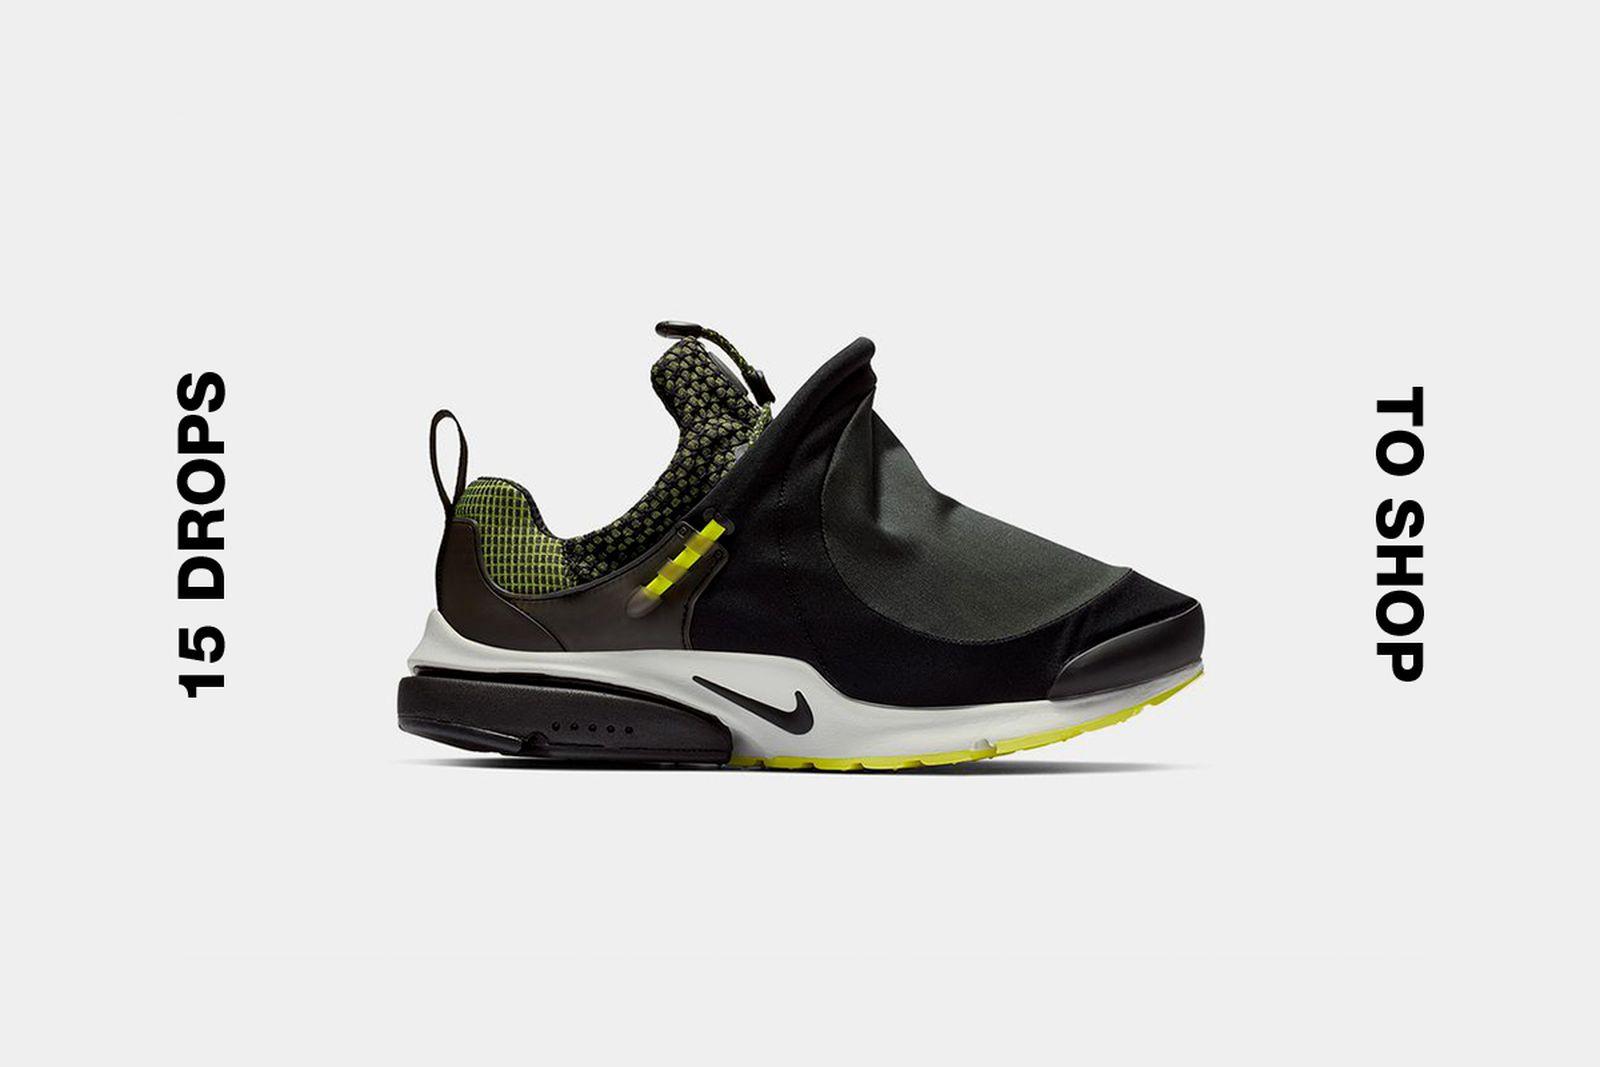 comme des garcons nike air presto best drops buy Nike Air Presto Foot Tent Salomon S/LAB Undefeated